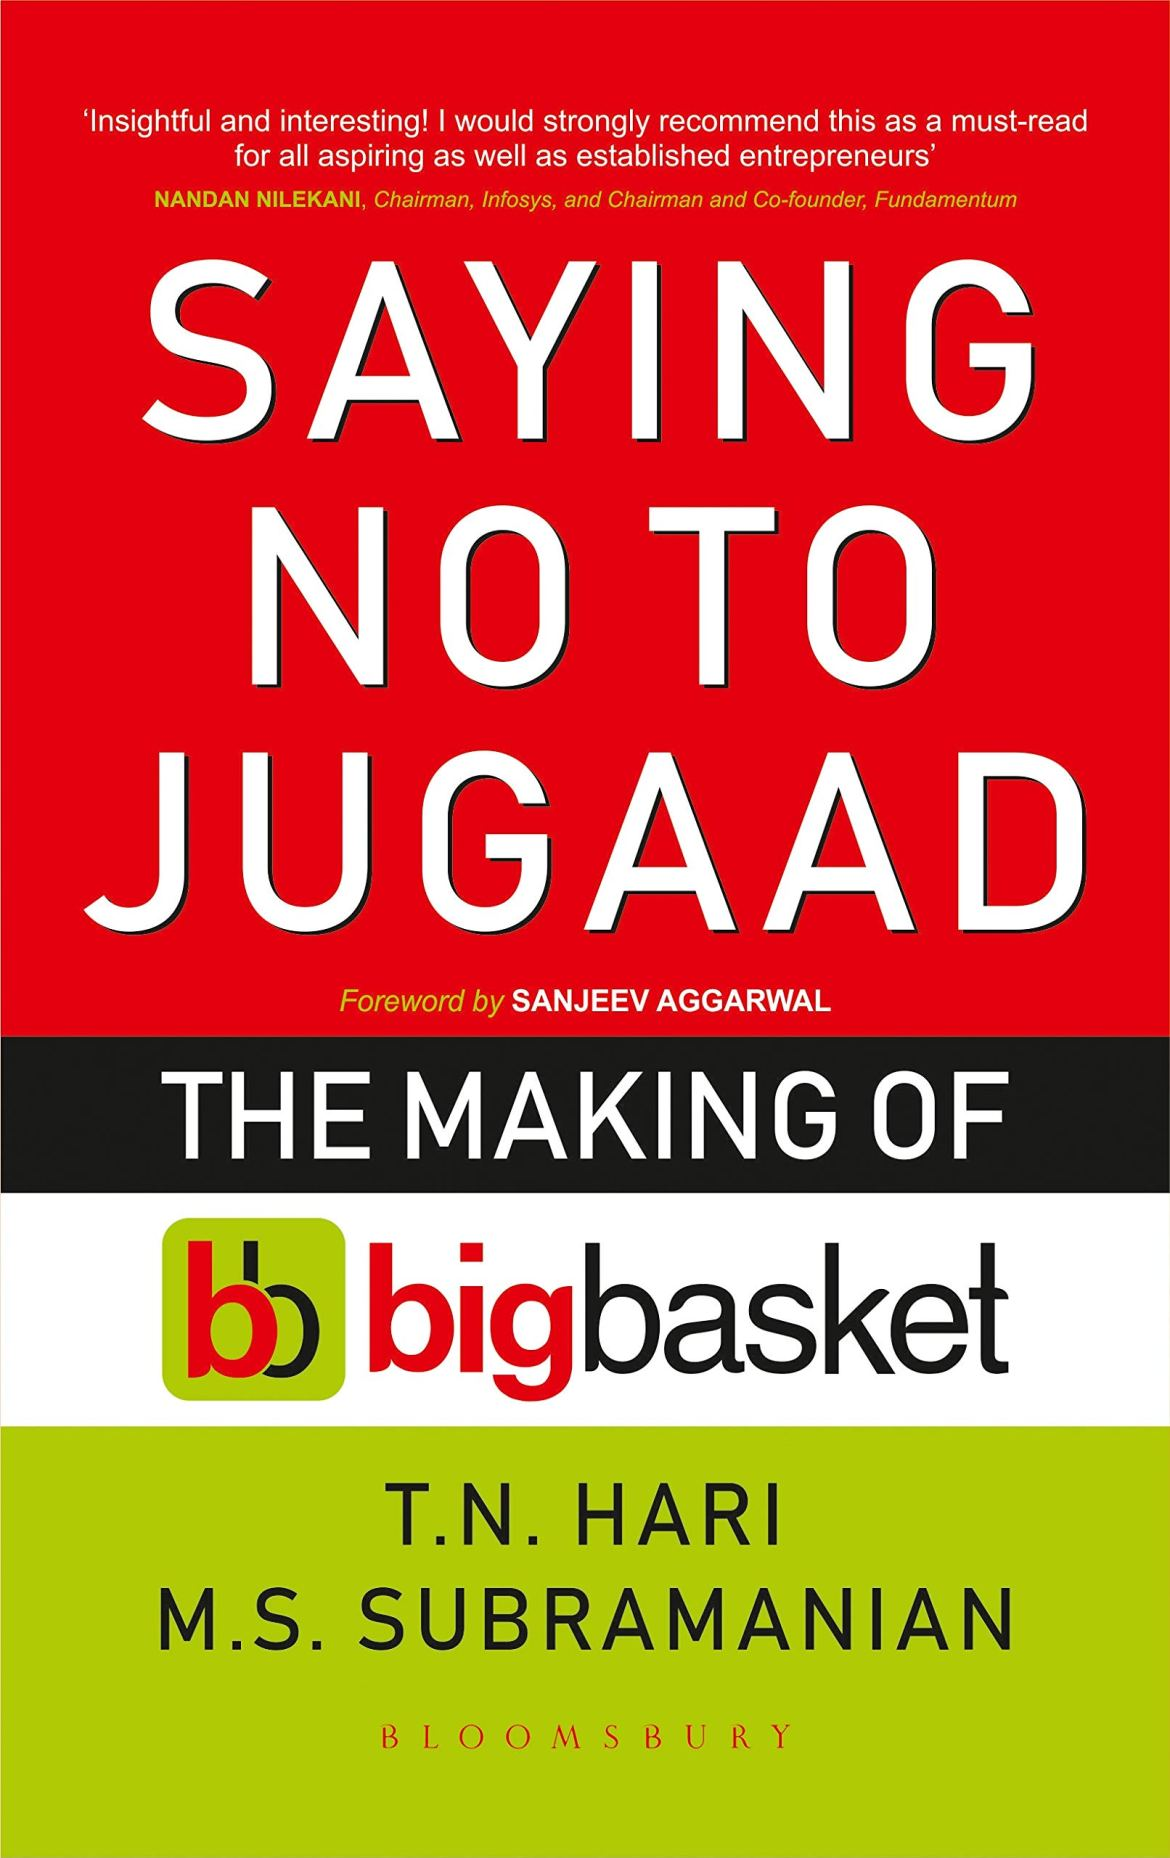 Saying No To Jugaad: The Making Of Bigbasket: TN Hari and MS Subramanian:  9789389351088: Amazon.com: Books